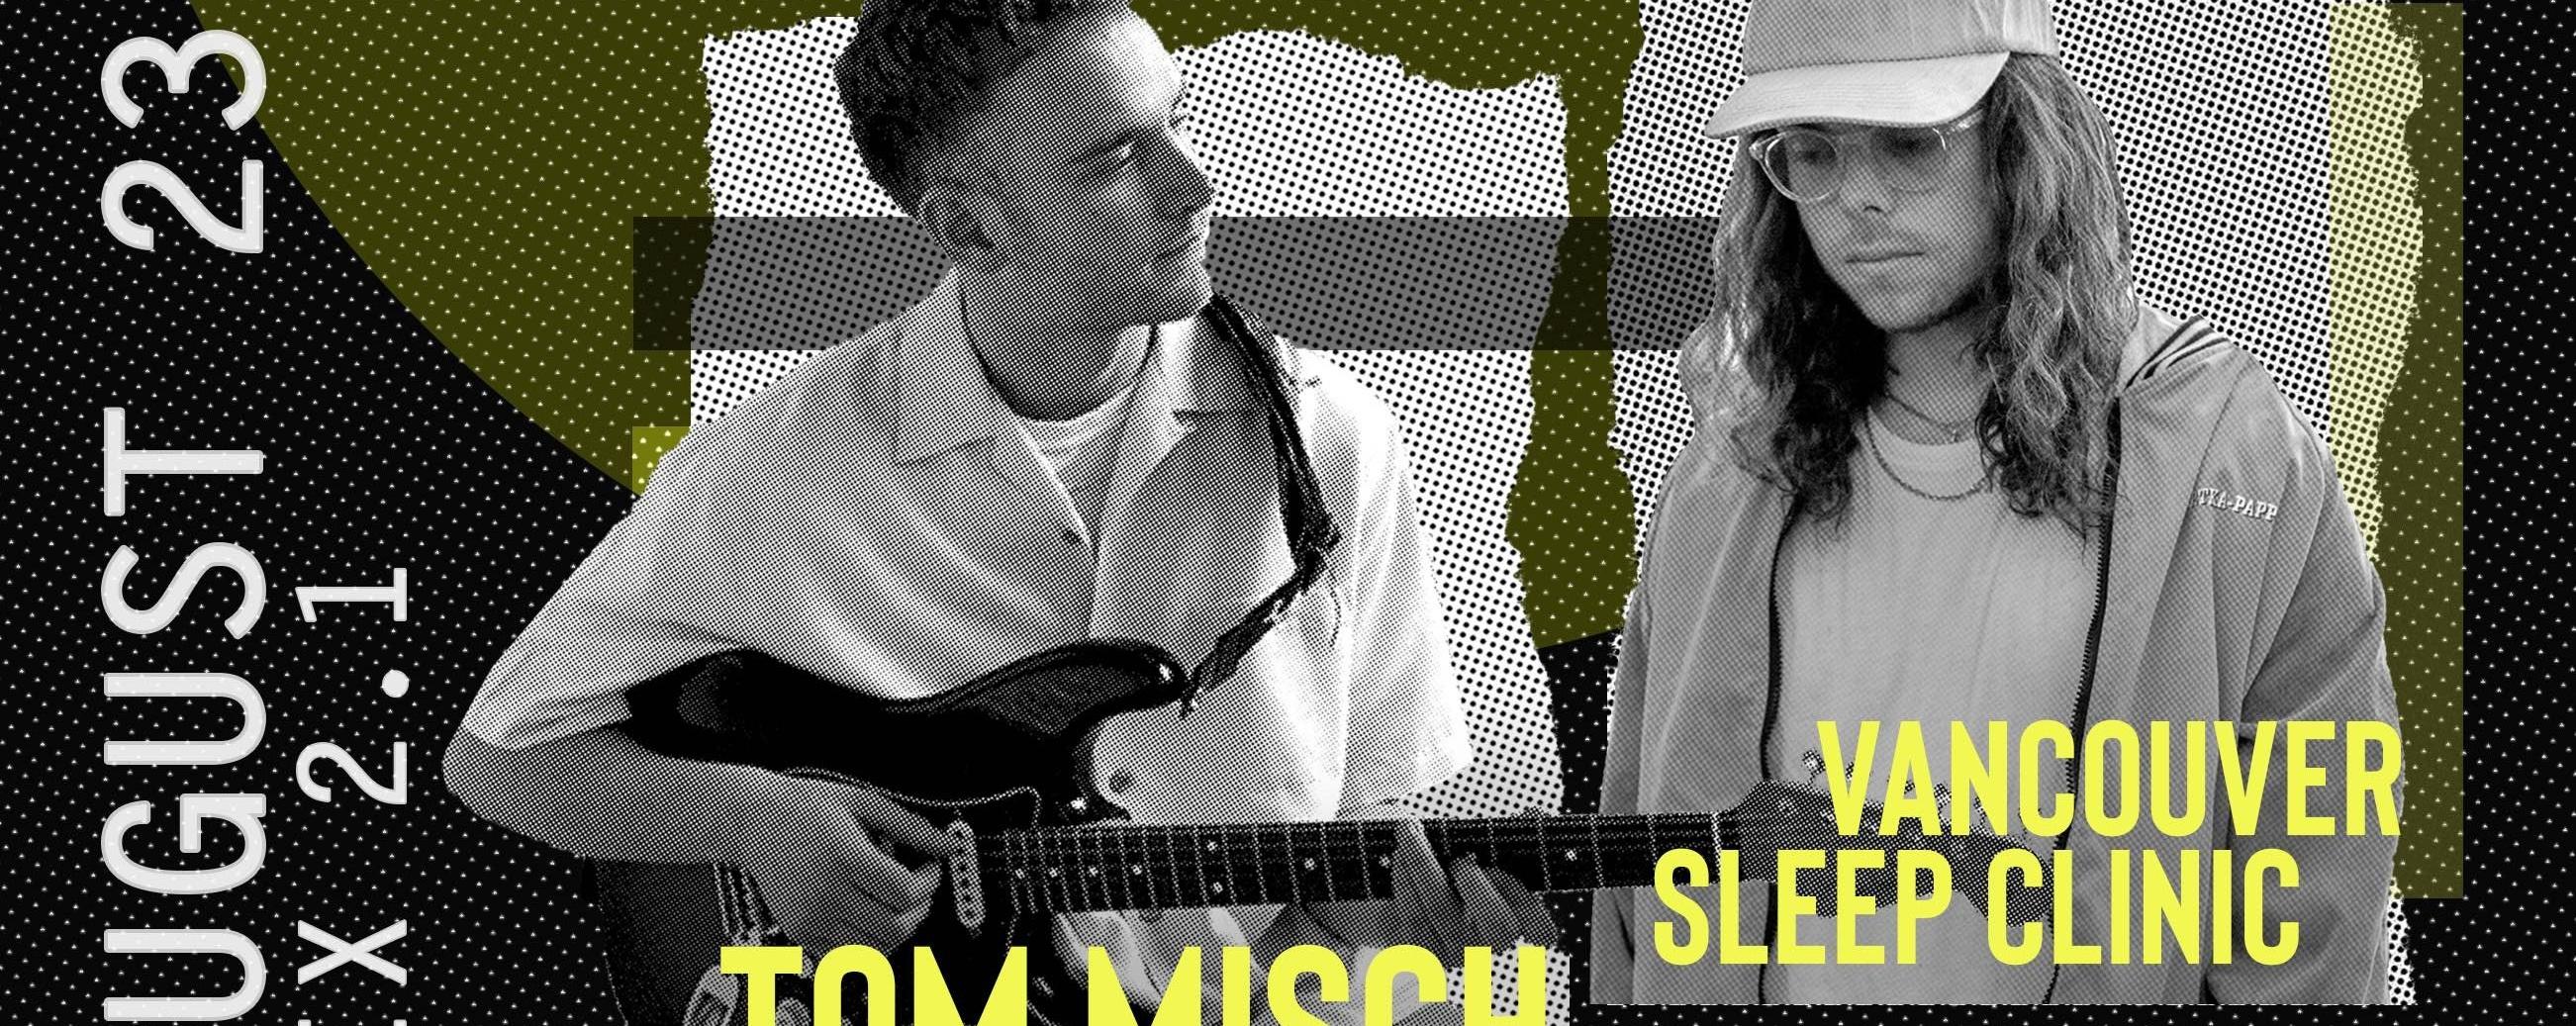 Karpos Live Mix 2.1 Tom Misch &Vancouver Sleep Clinic